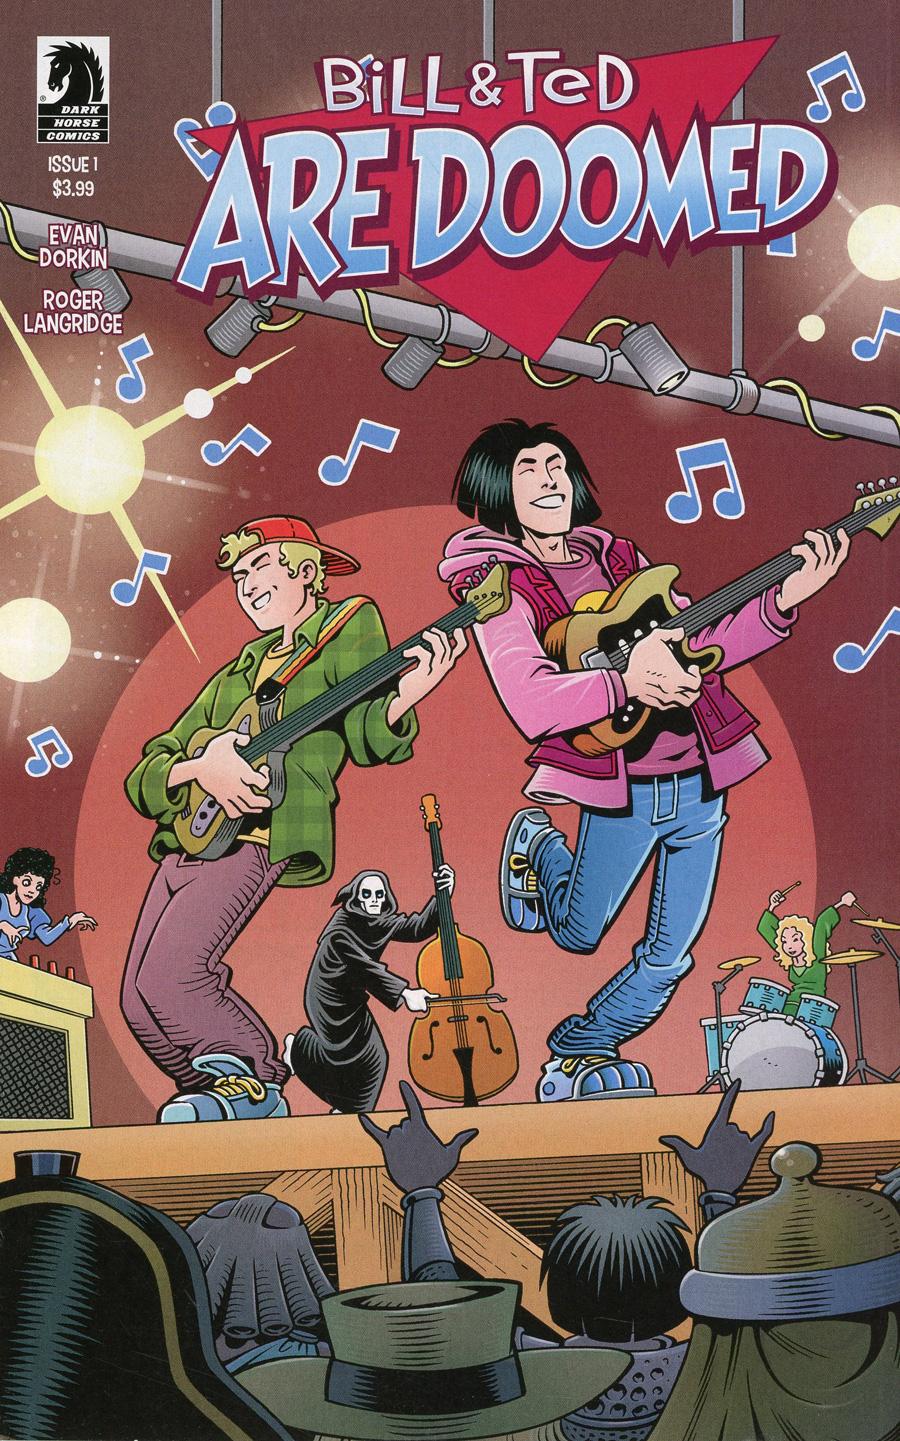 Bill & Ted Are Doomed #1 Cover B Variant Roger Langridge Cover